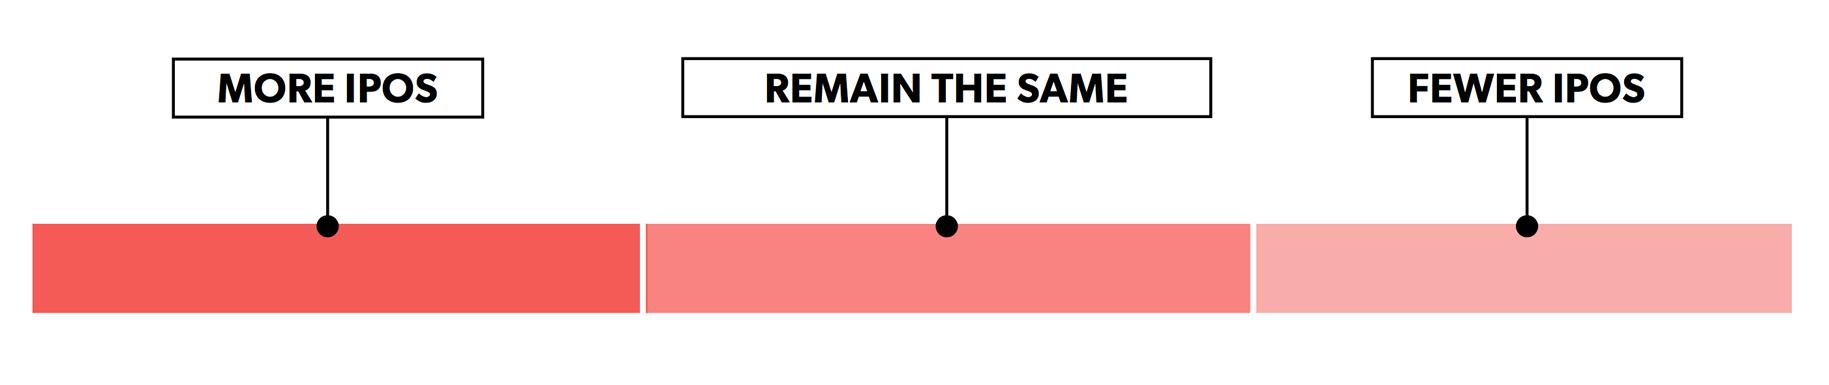 IPO Graphic